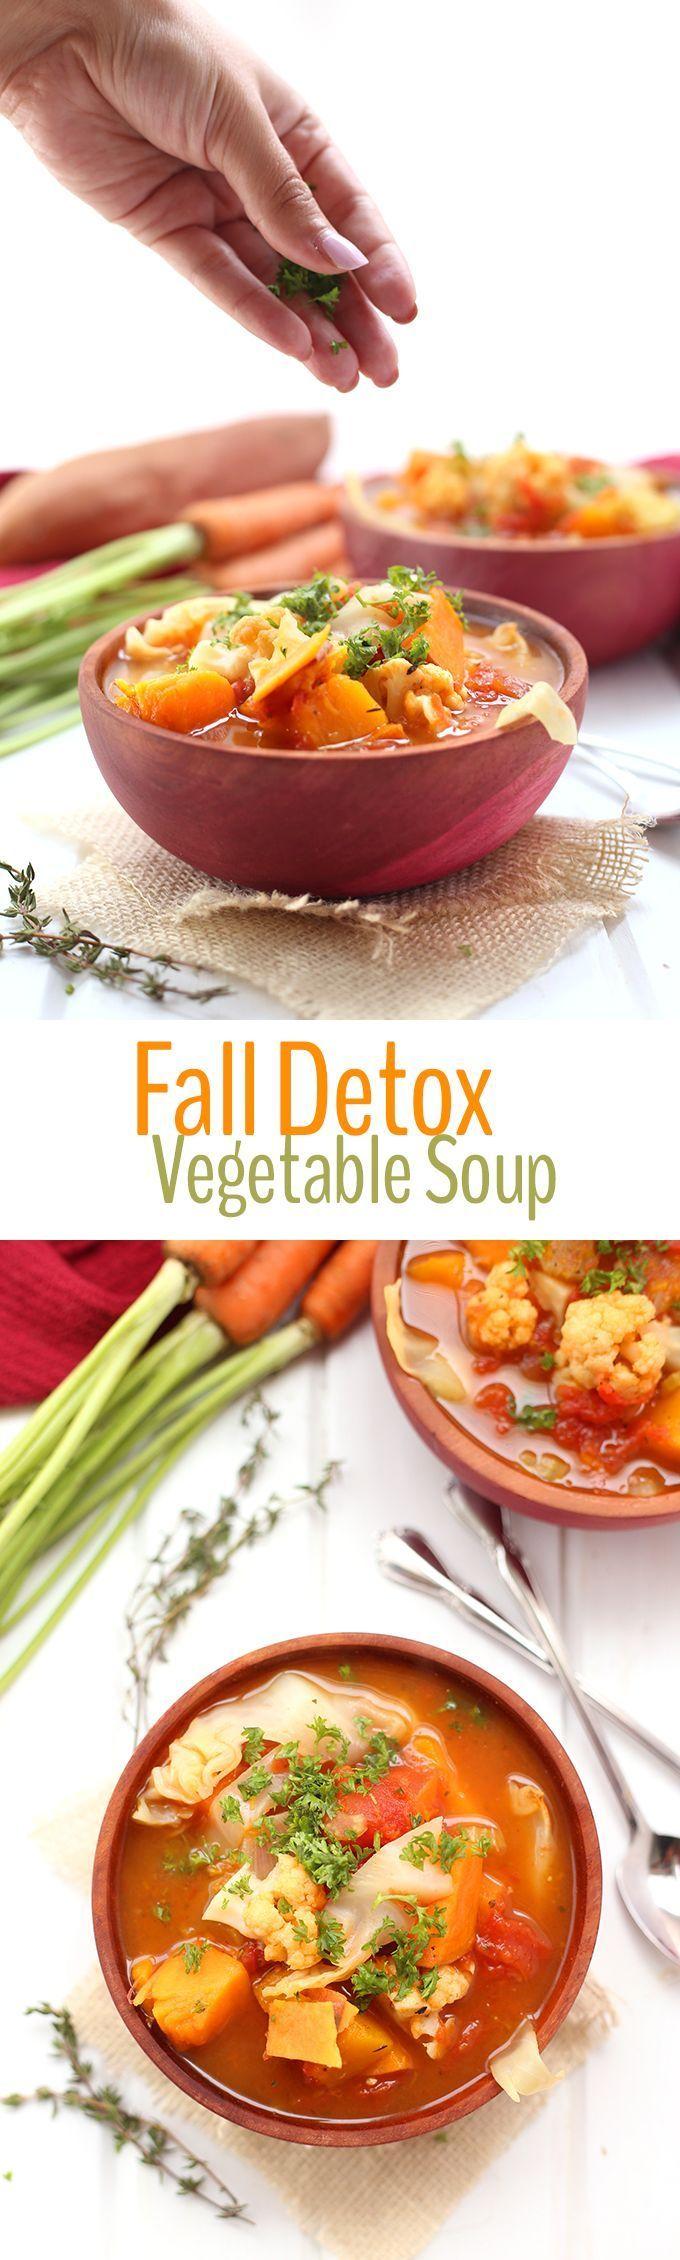 Detox australia kinsei womens Soup asics   Veggie Fall